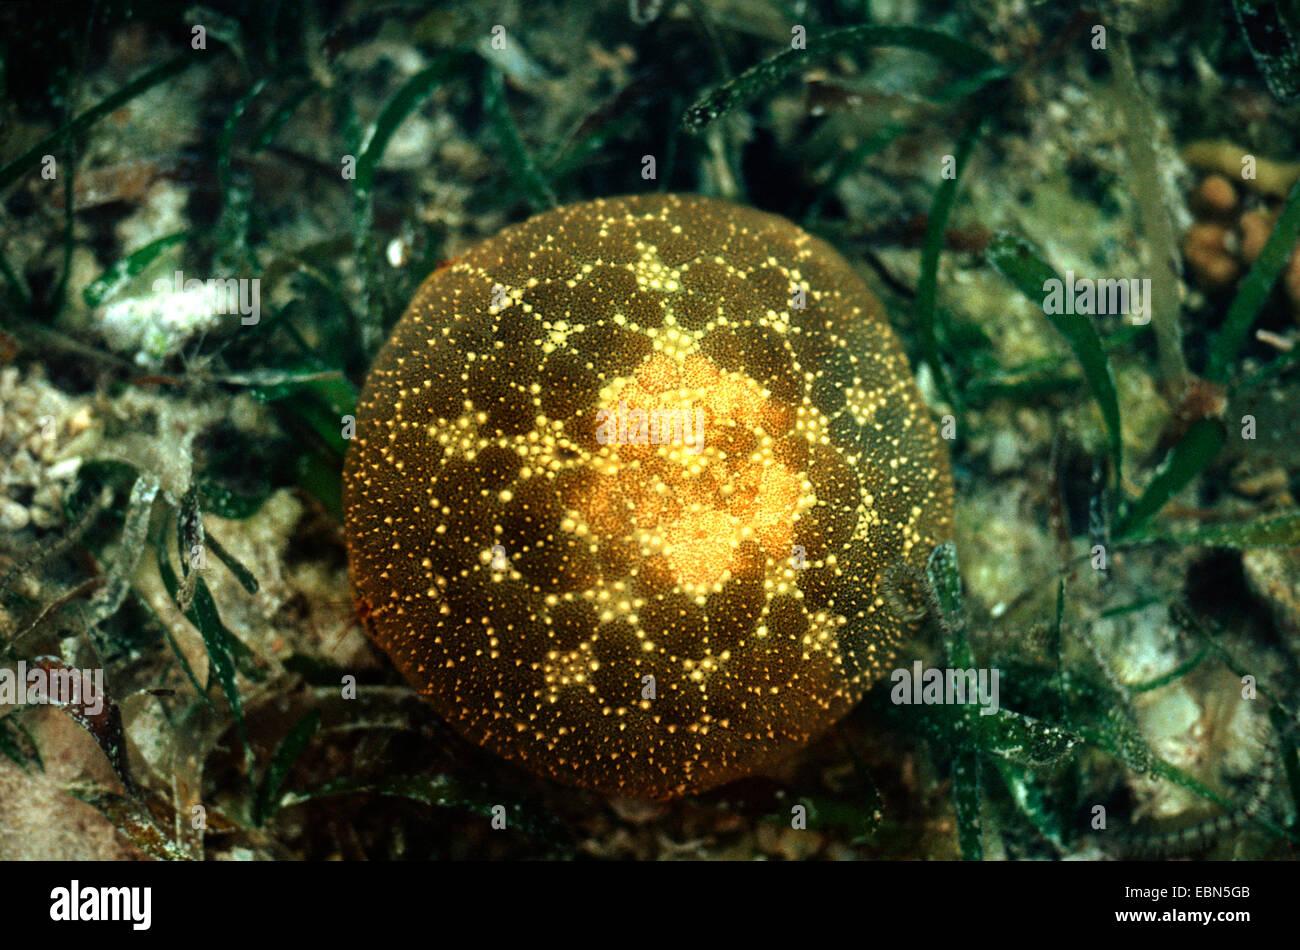 pincushion star, pincushion starfish (Culcita spec.), sitting on the ocean ground - Stock Image